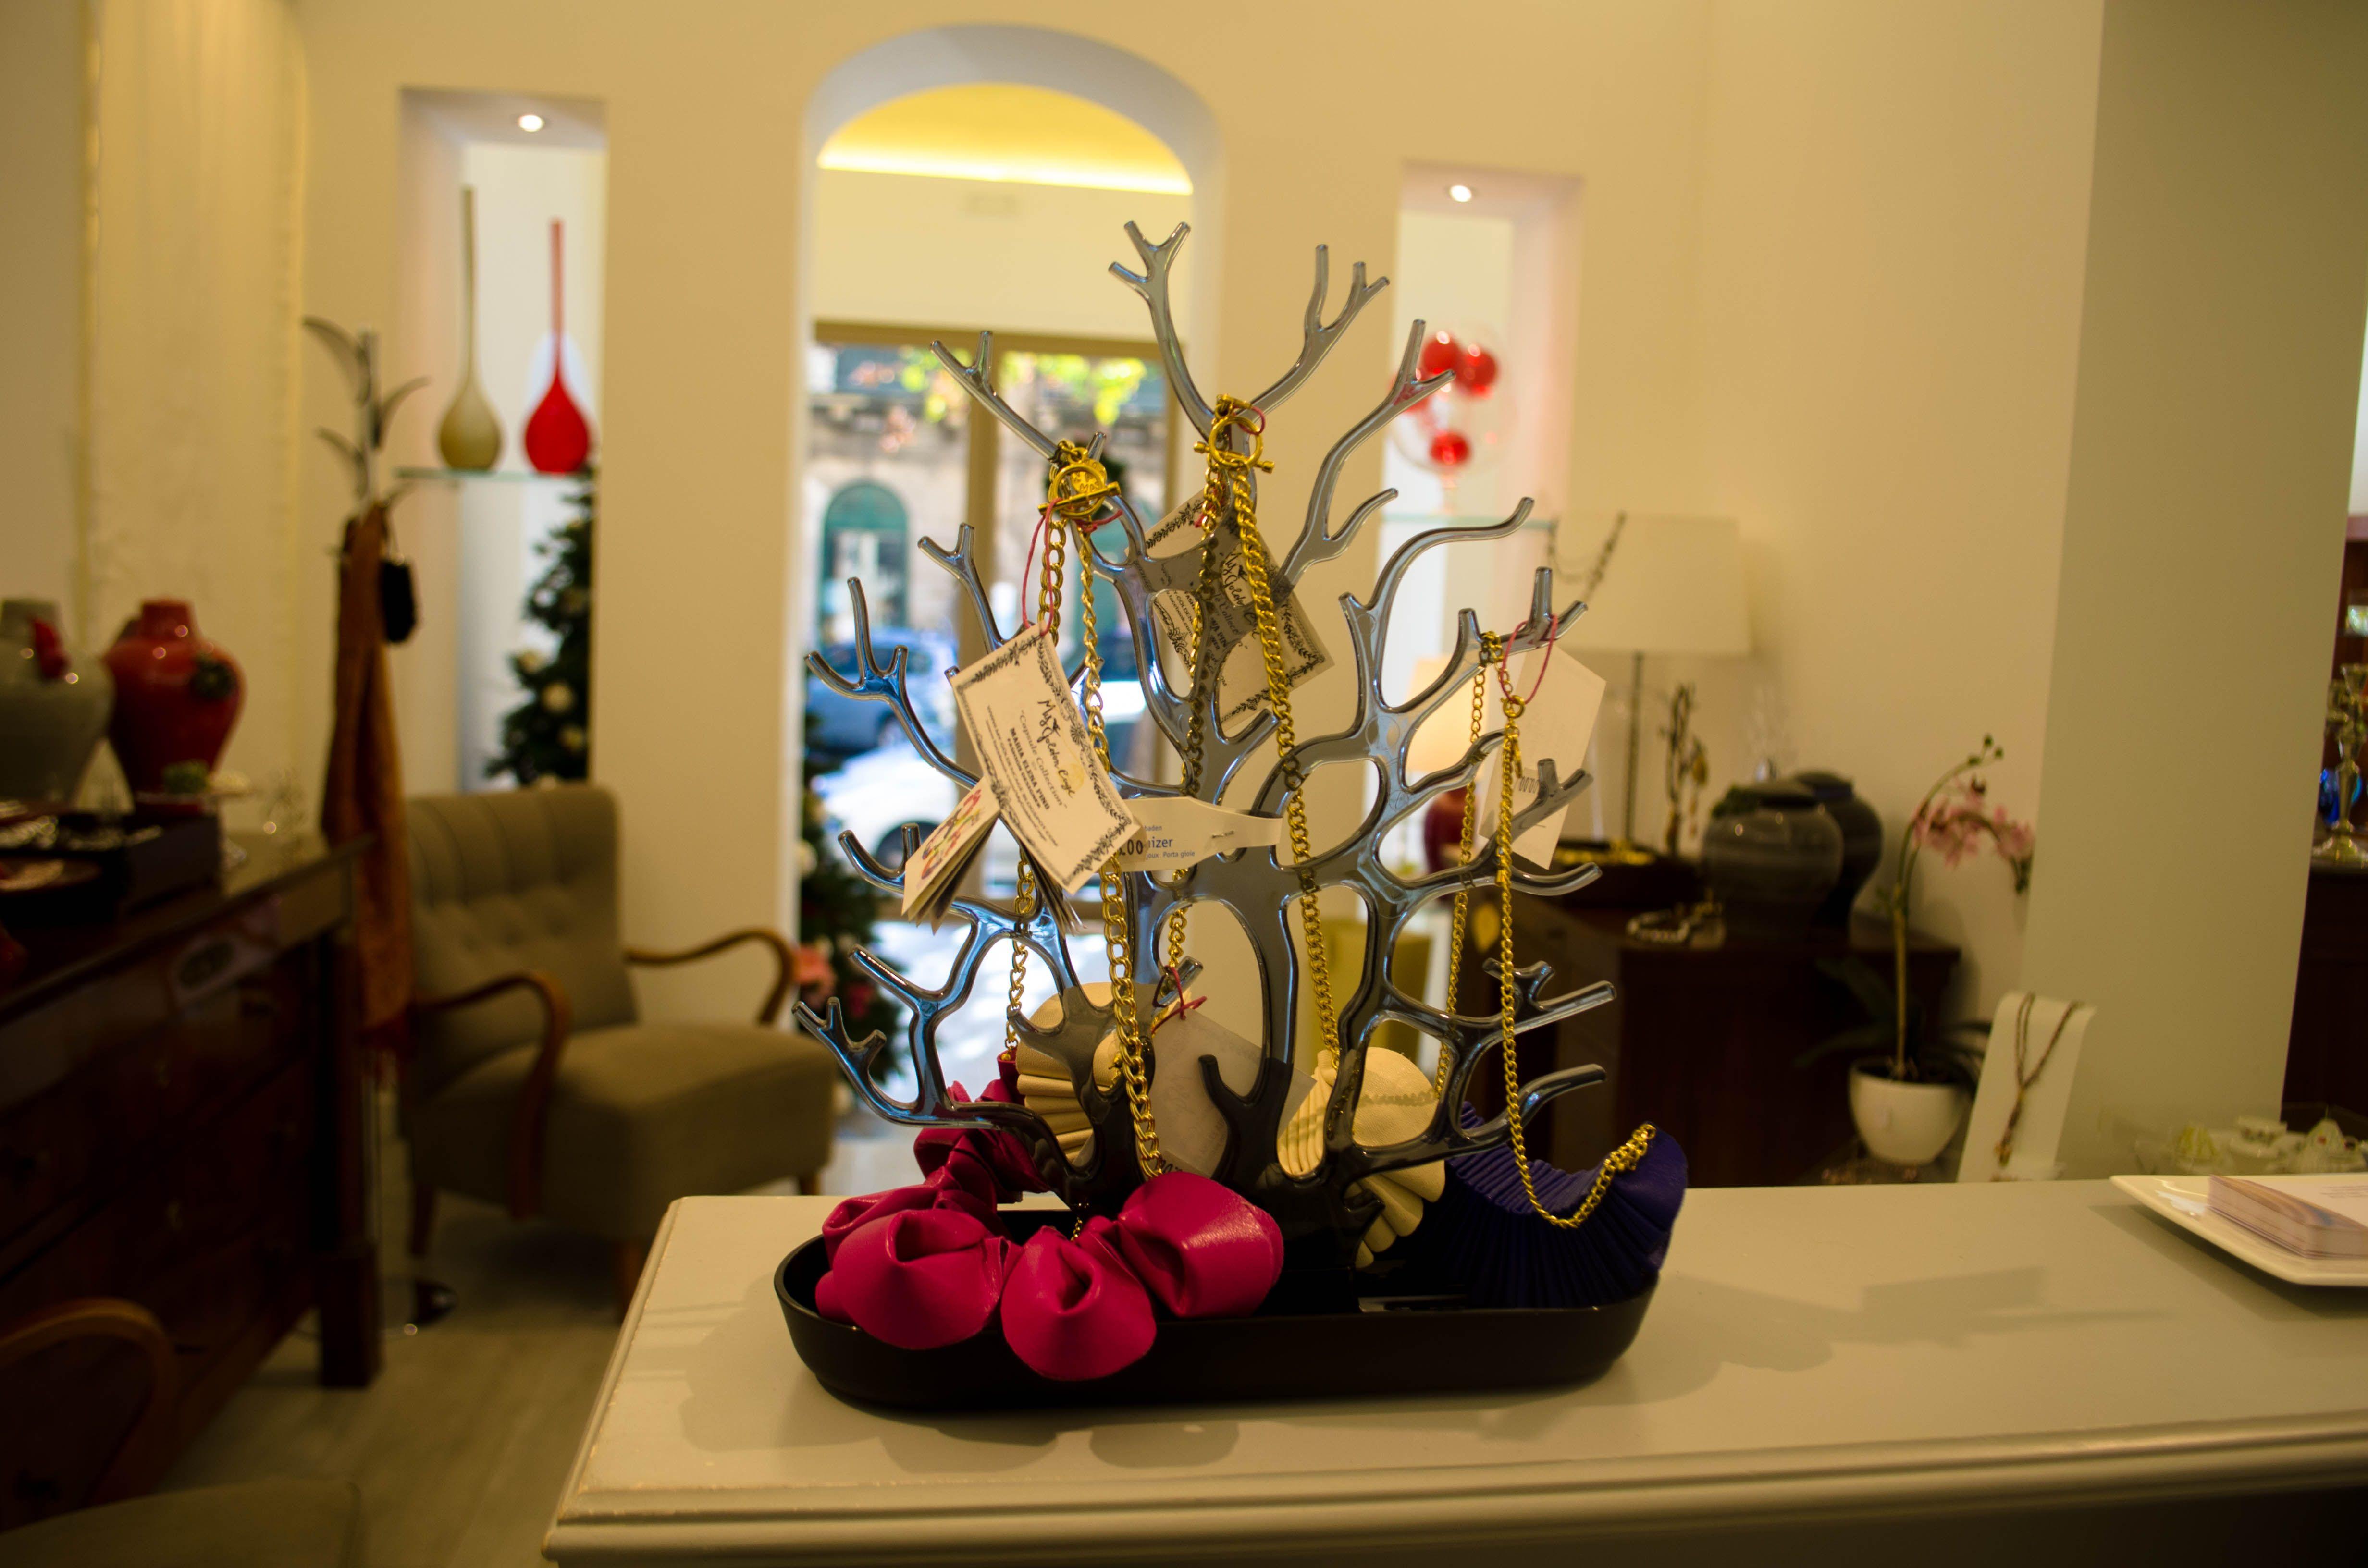 #Natale #Madì #ListeNozze #Regali #Palermo